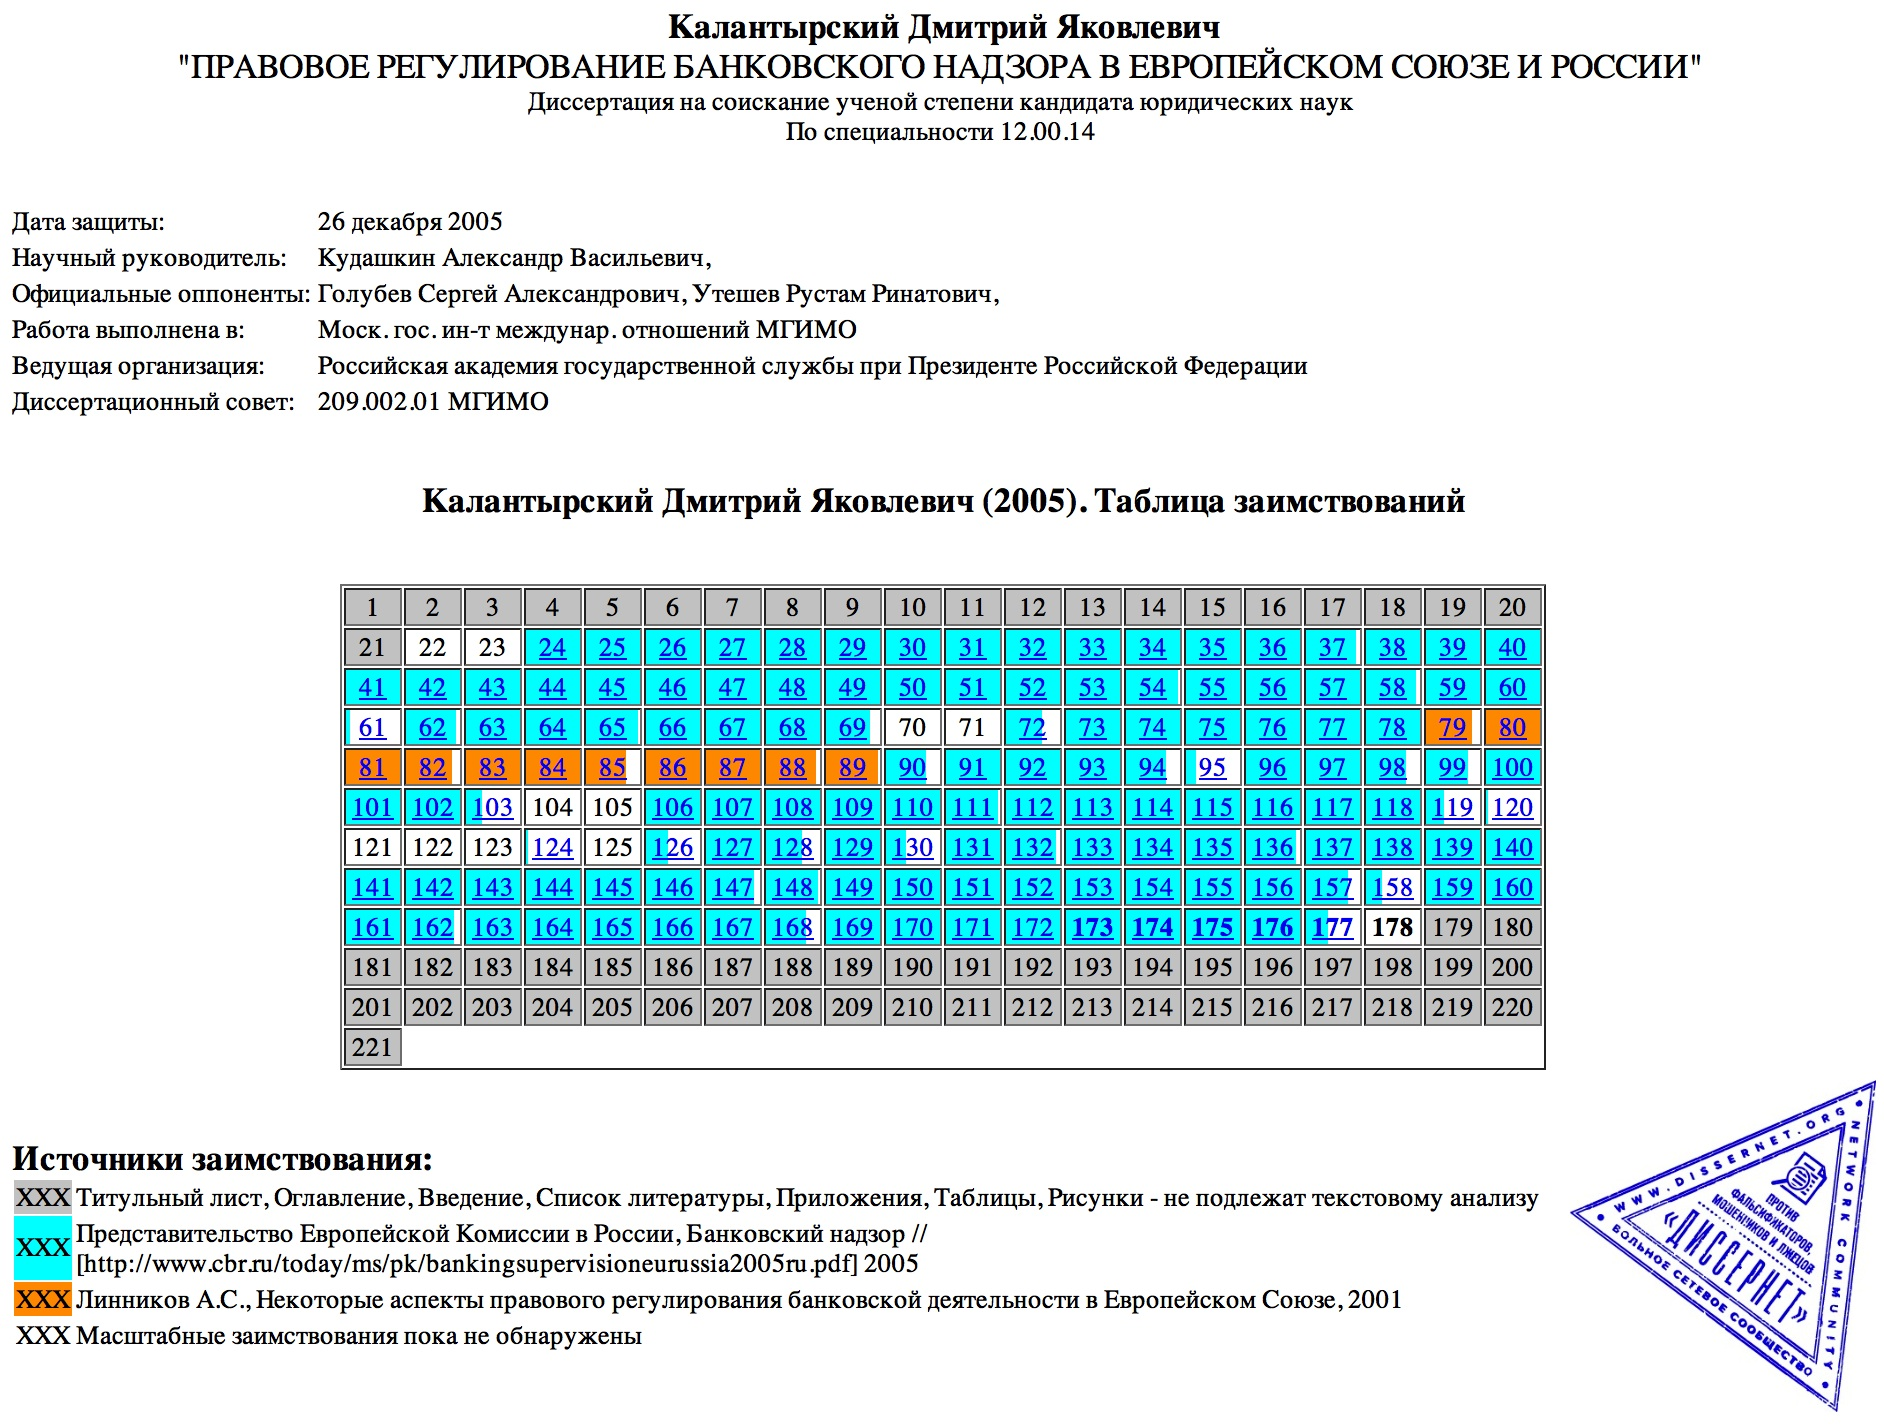 Kalantyrsky-table